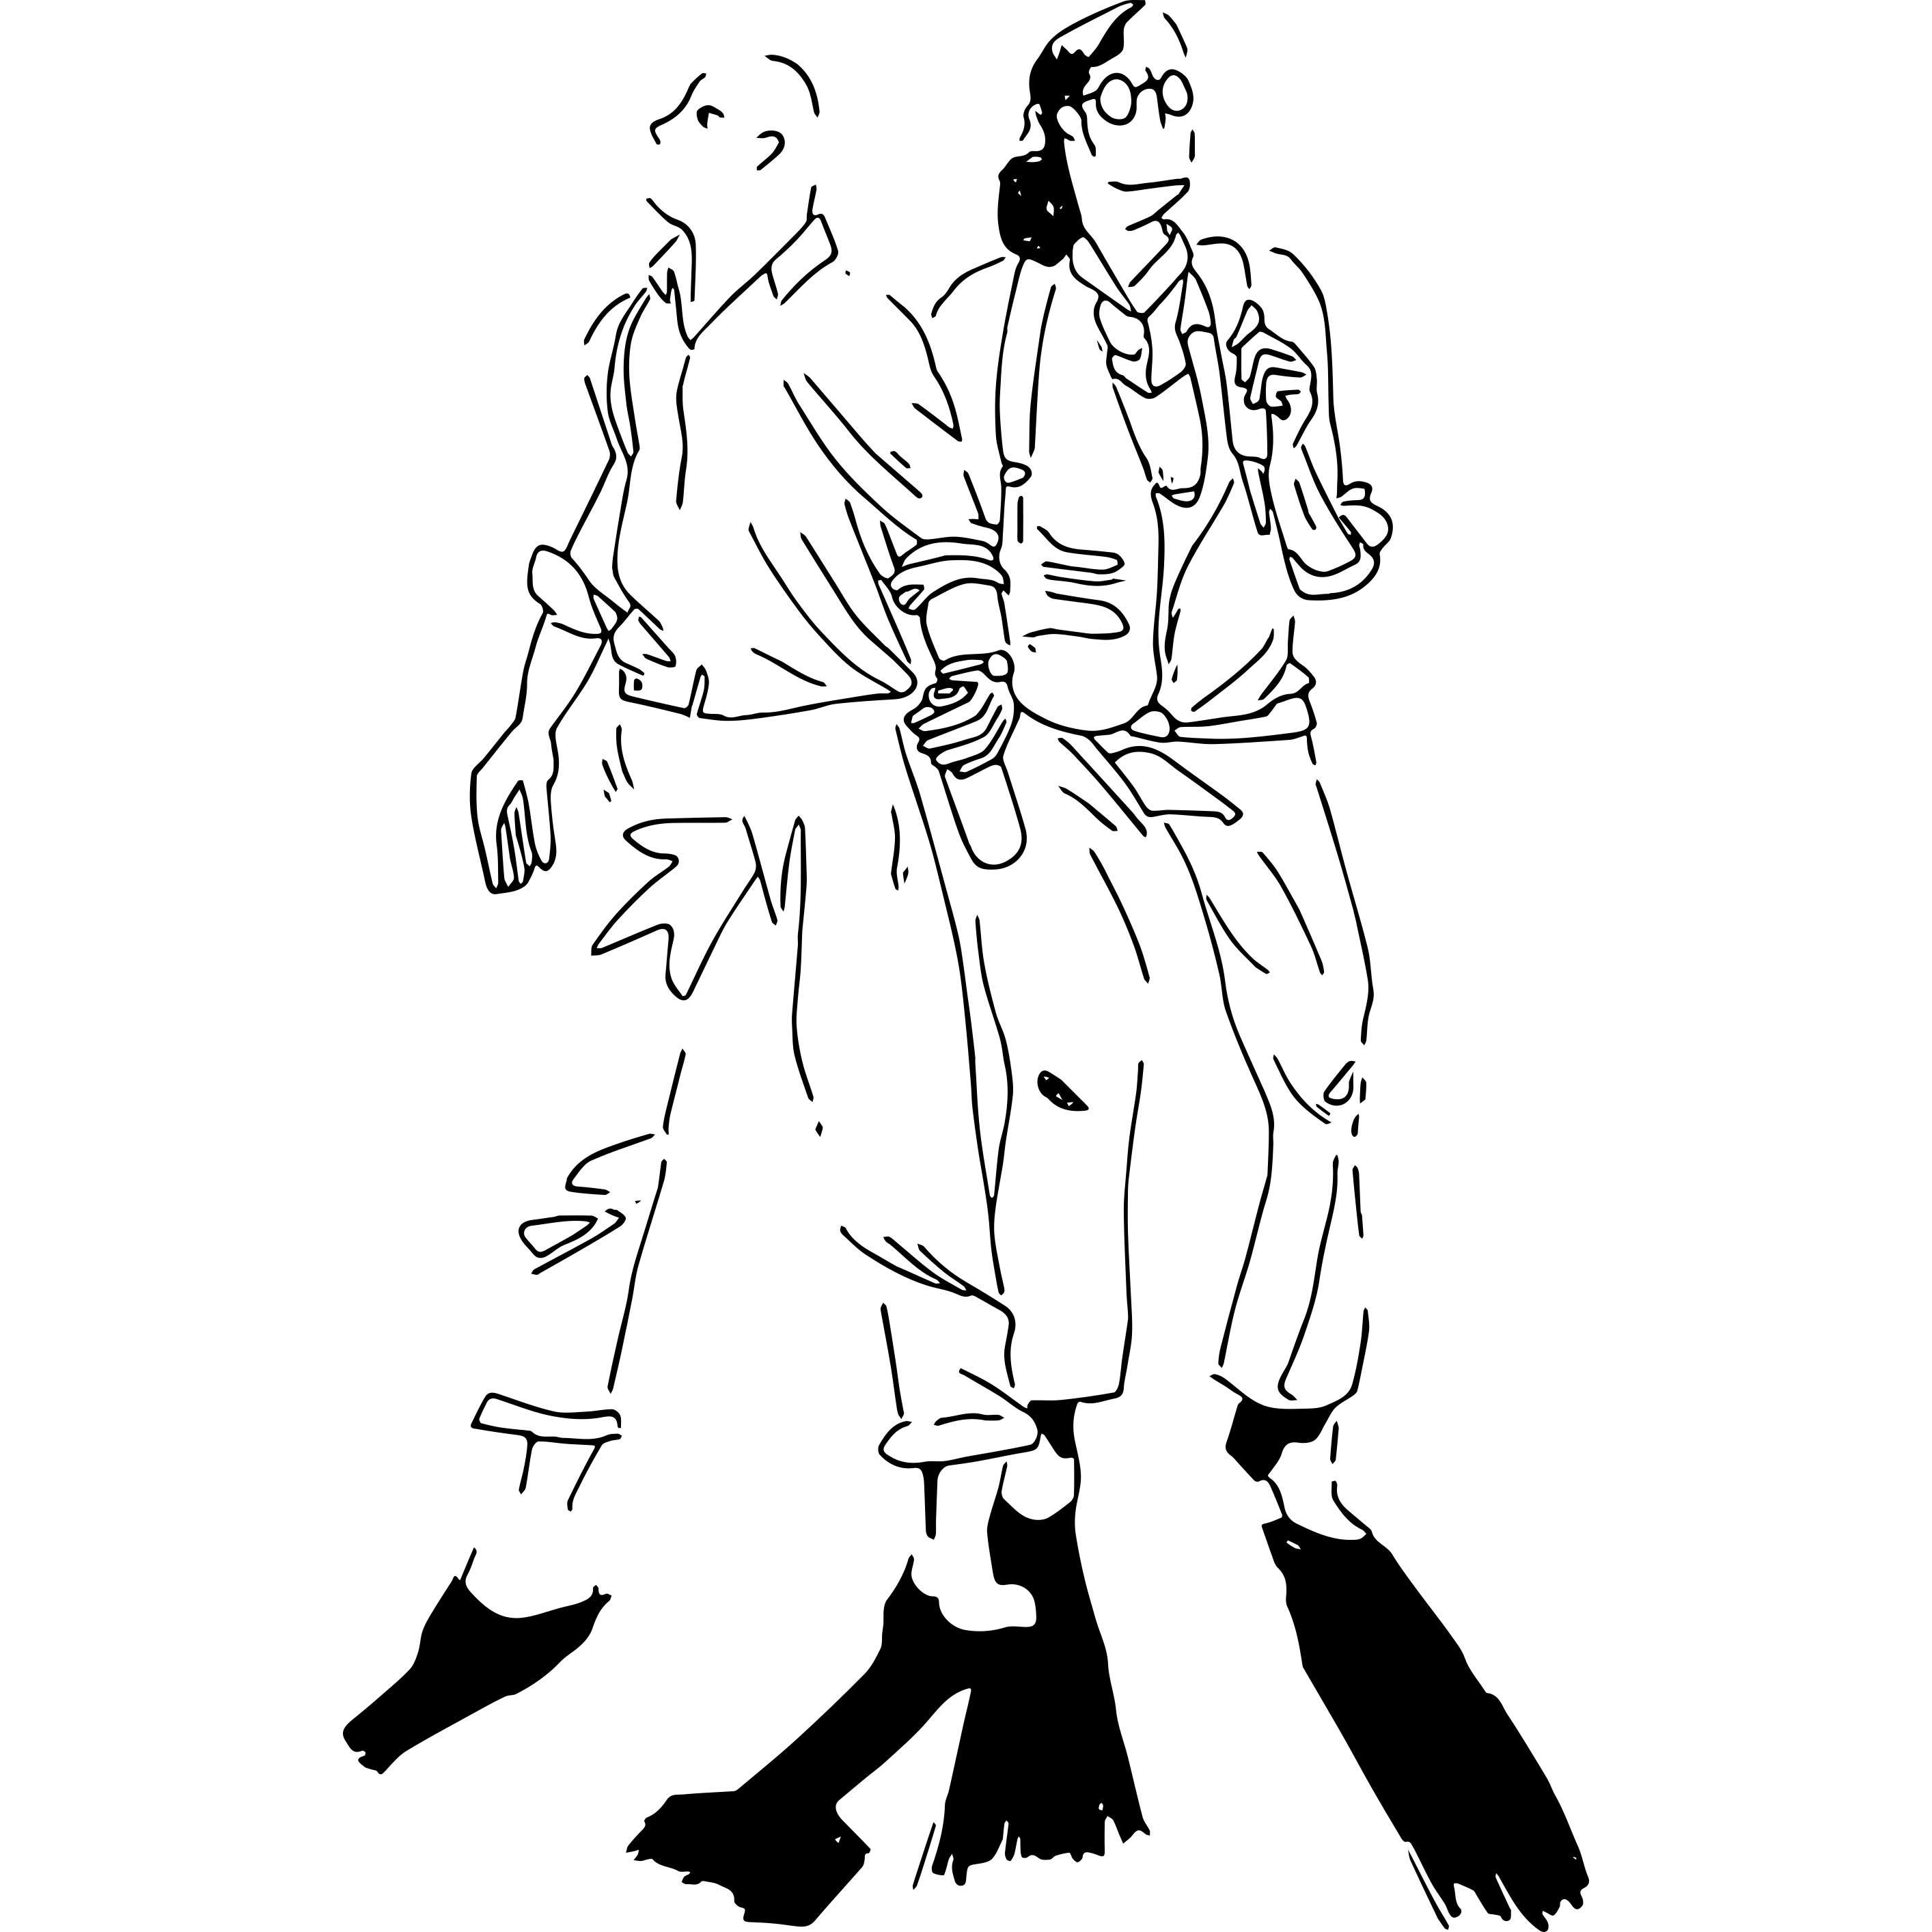 ink_figure2